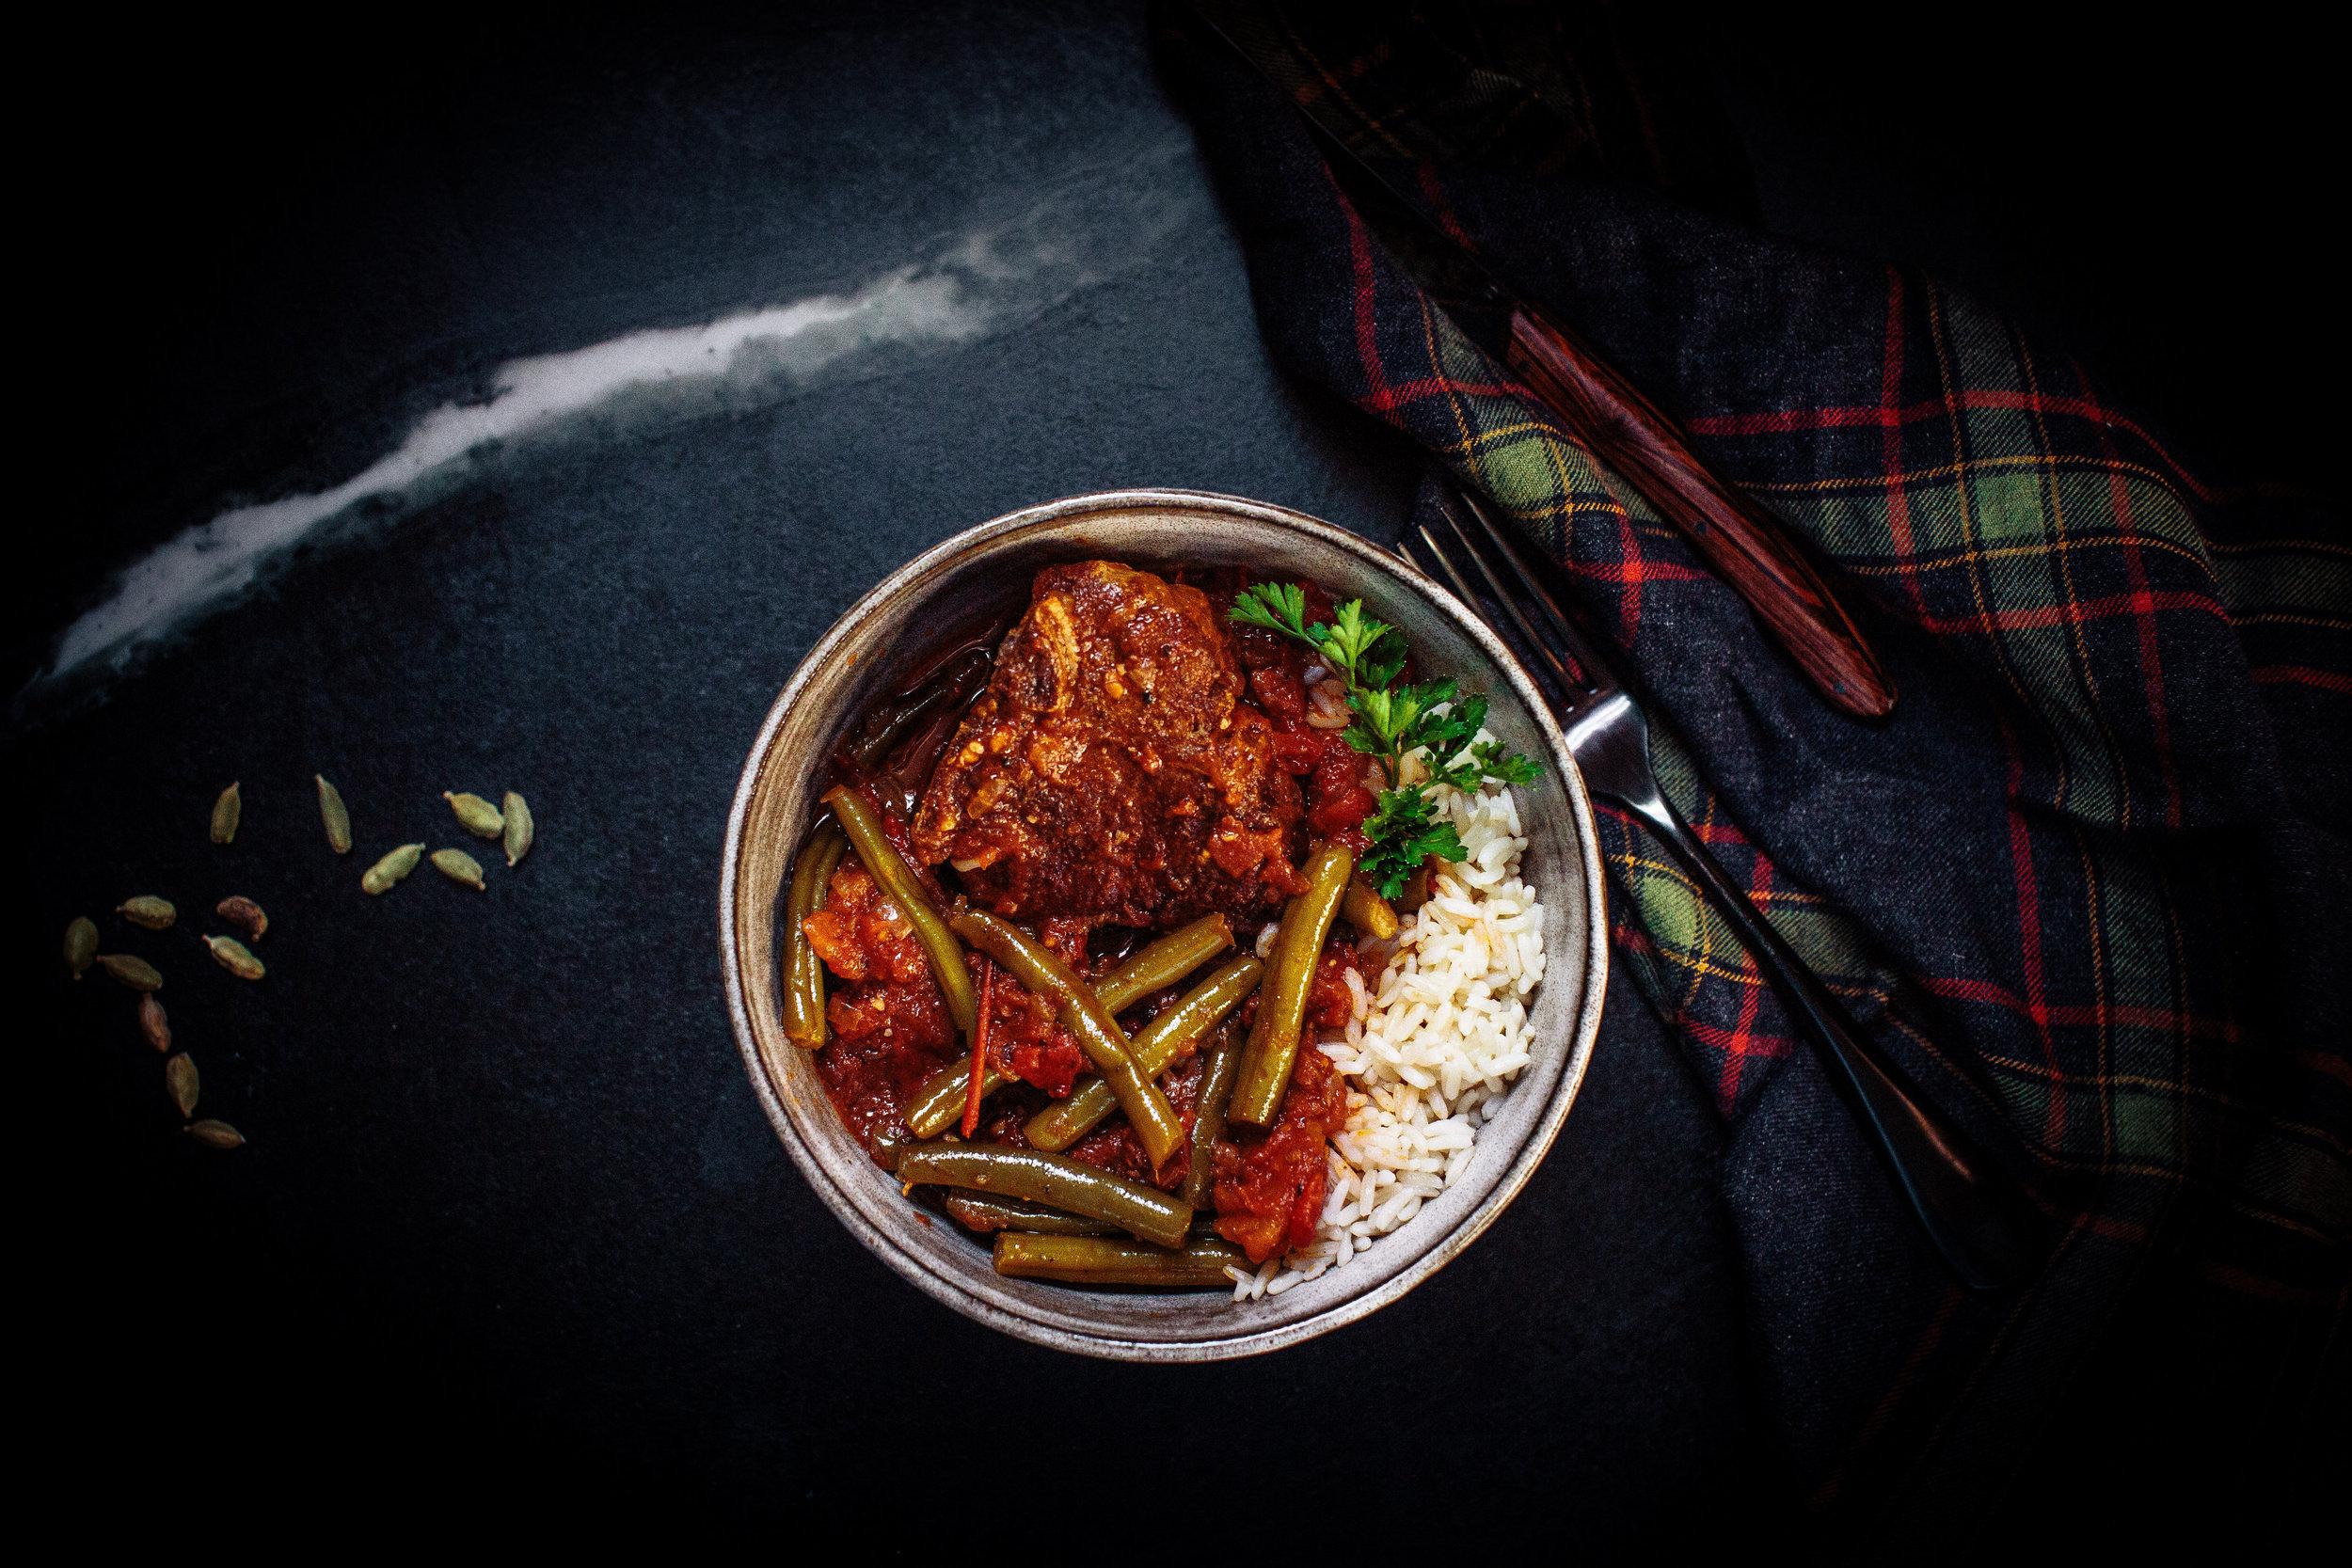 yahneh-recipe-dog-and-pig-show